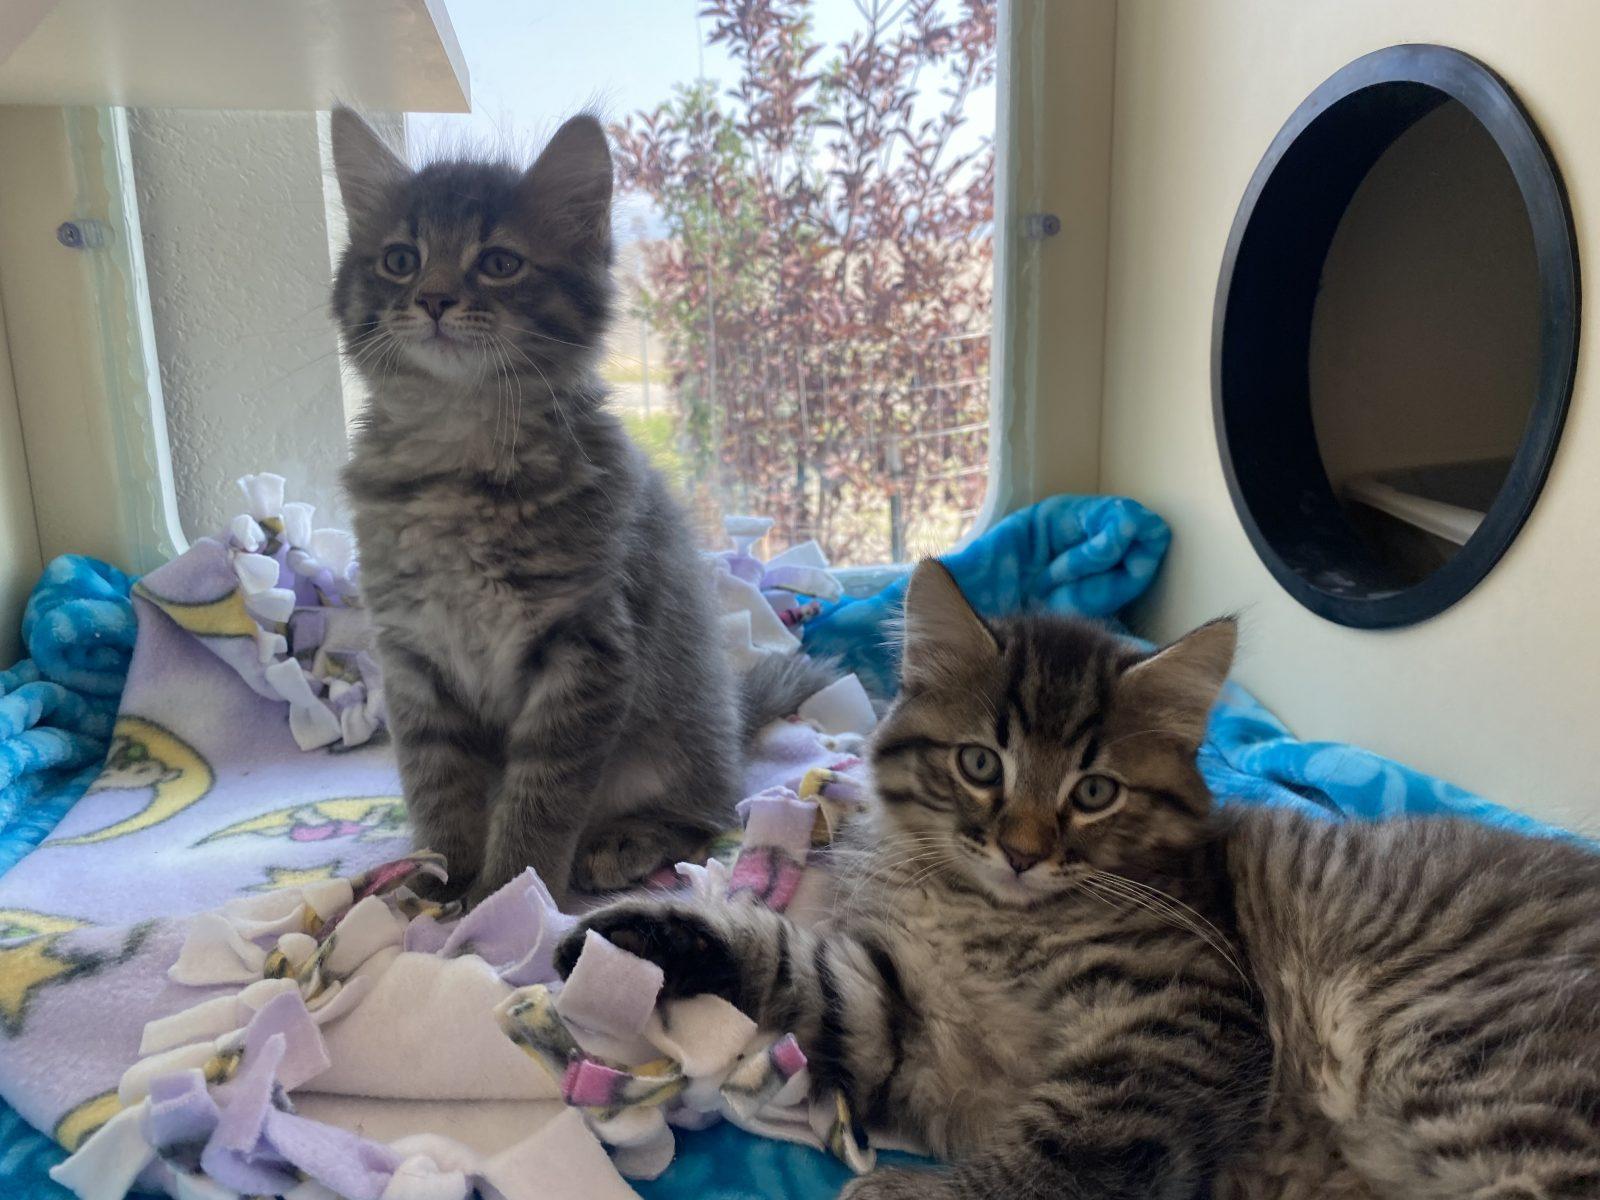 Found Kittens Outside?